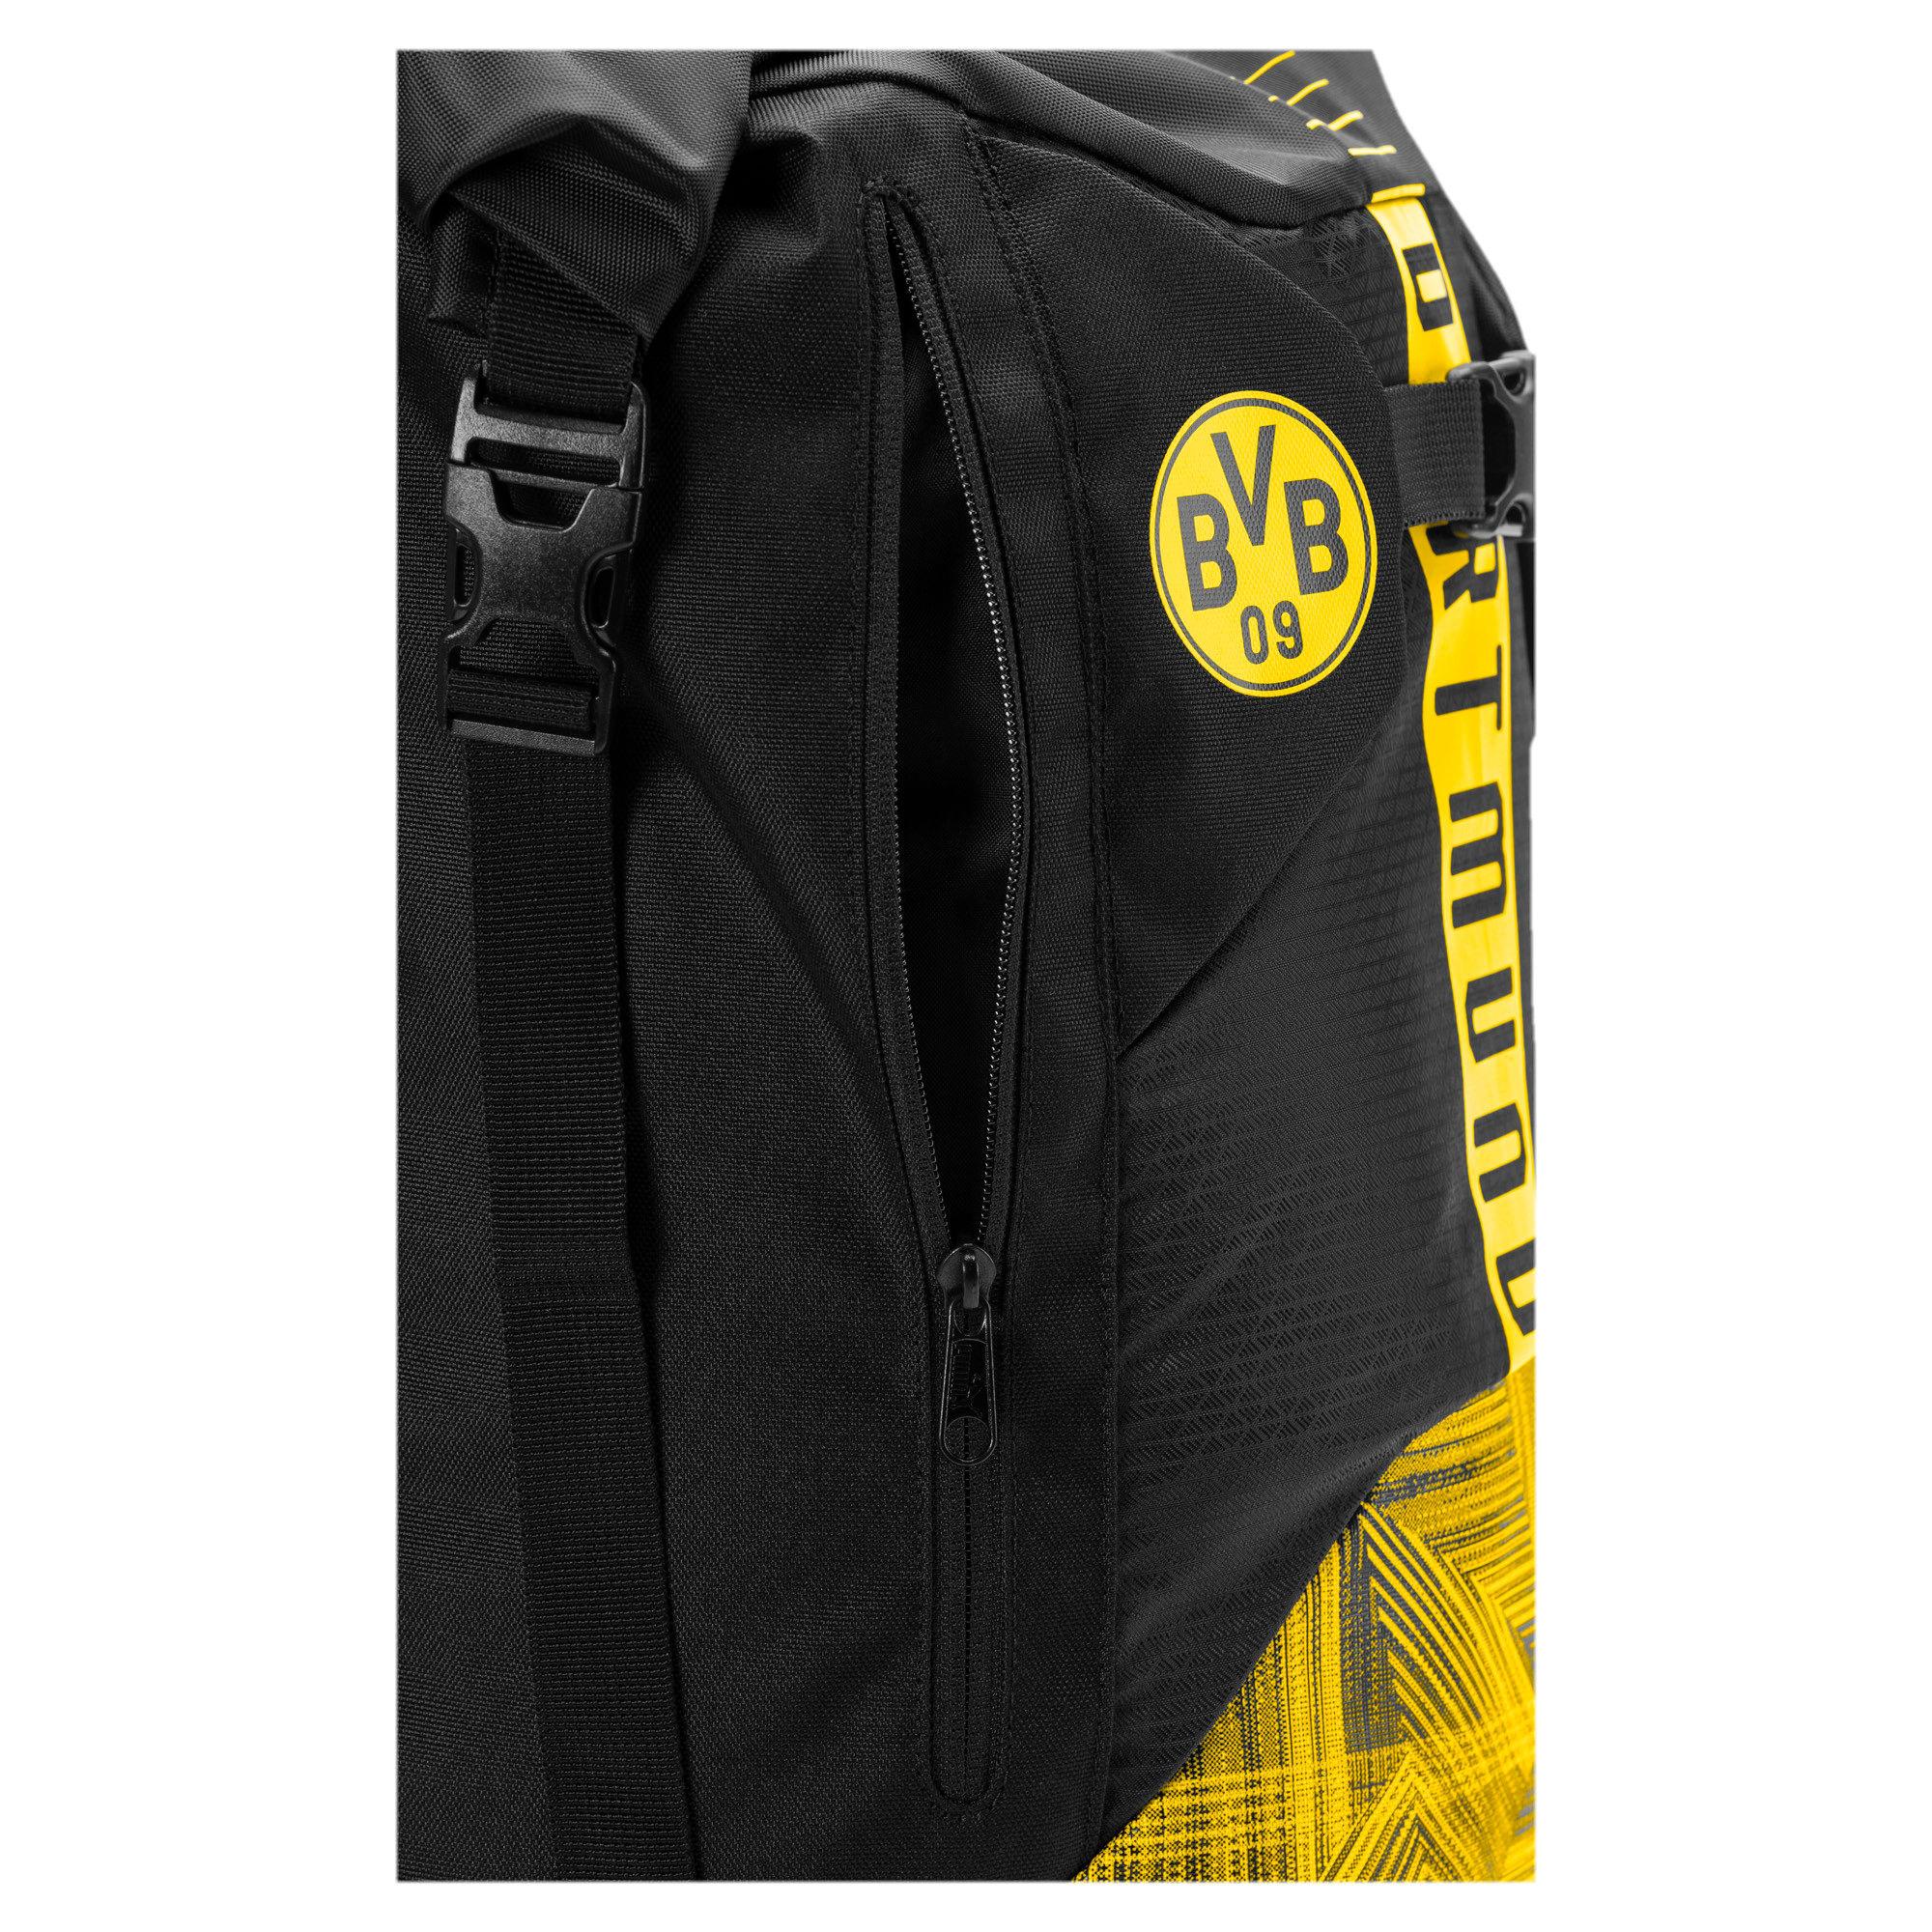 Thumbnail 3 of BVB Football Culture Rucksack, Puma Black-Cyber Yellow, medium